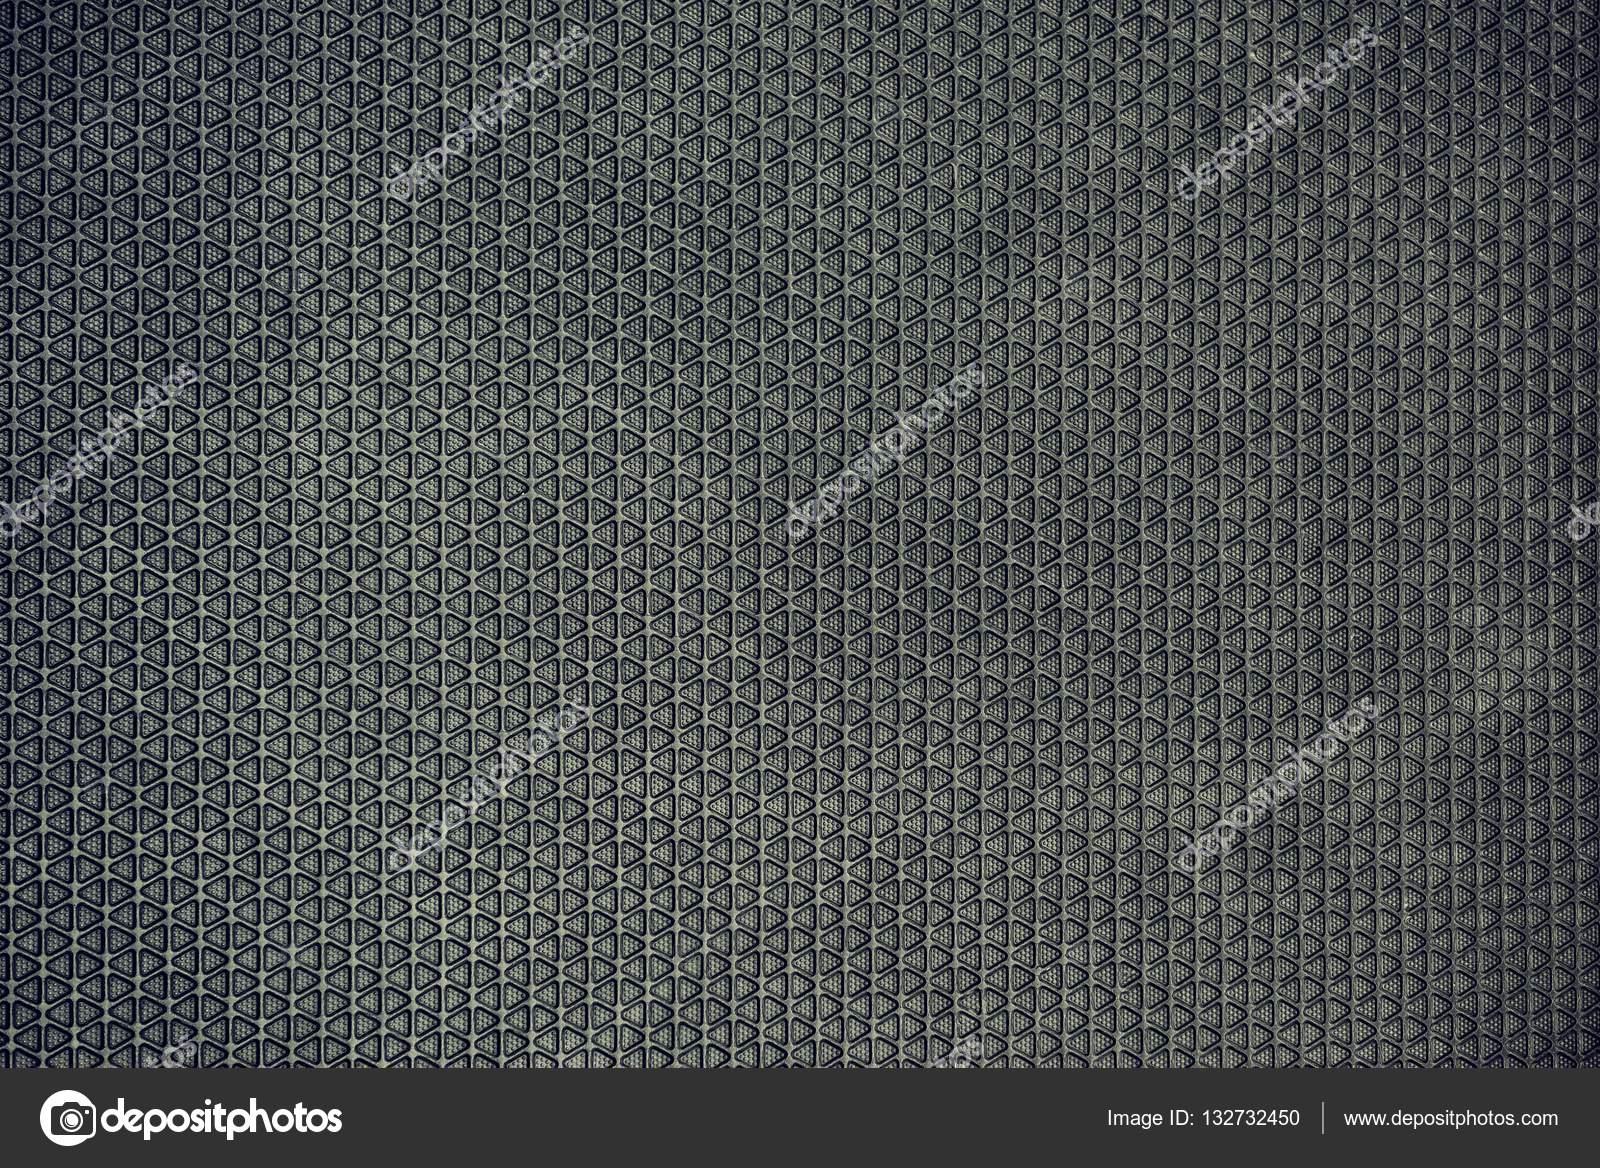 Fußbodenbelag Gummi ~ Dunklen kautschuk bodenbelag u2014 stockfoto © rawpixel #132732450